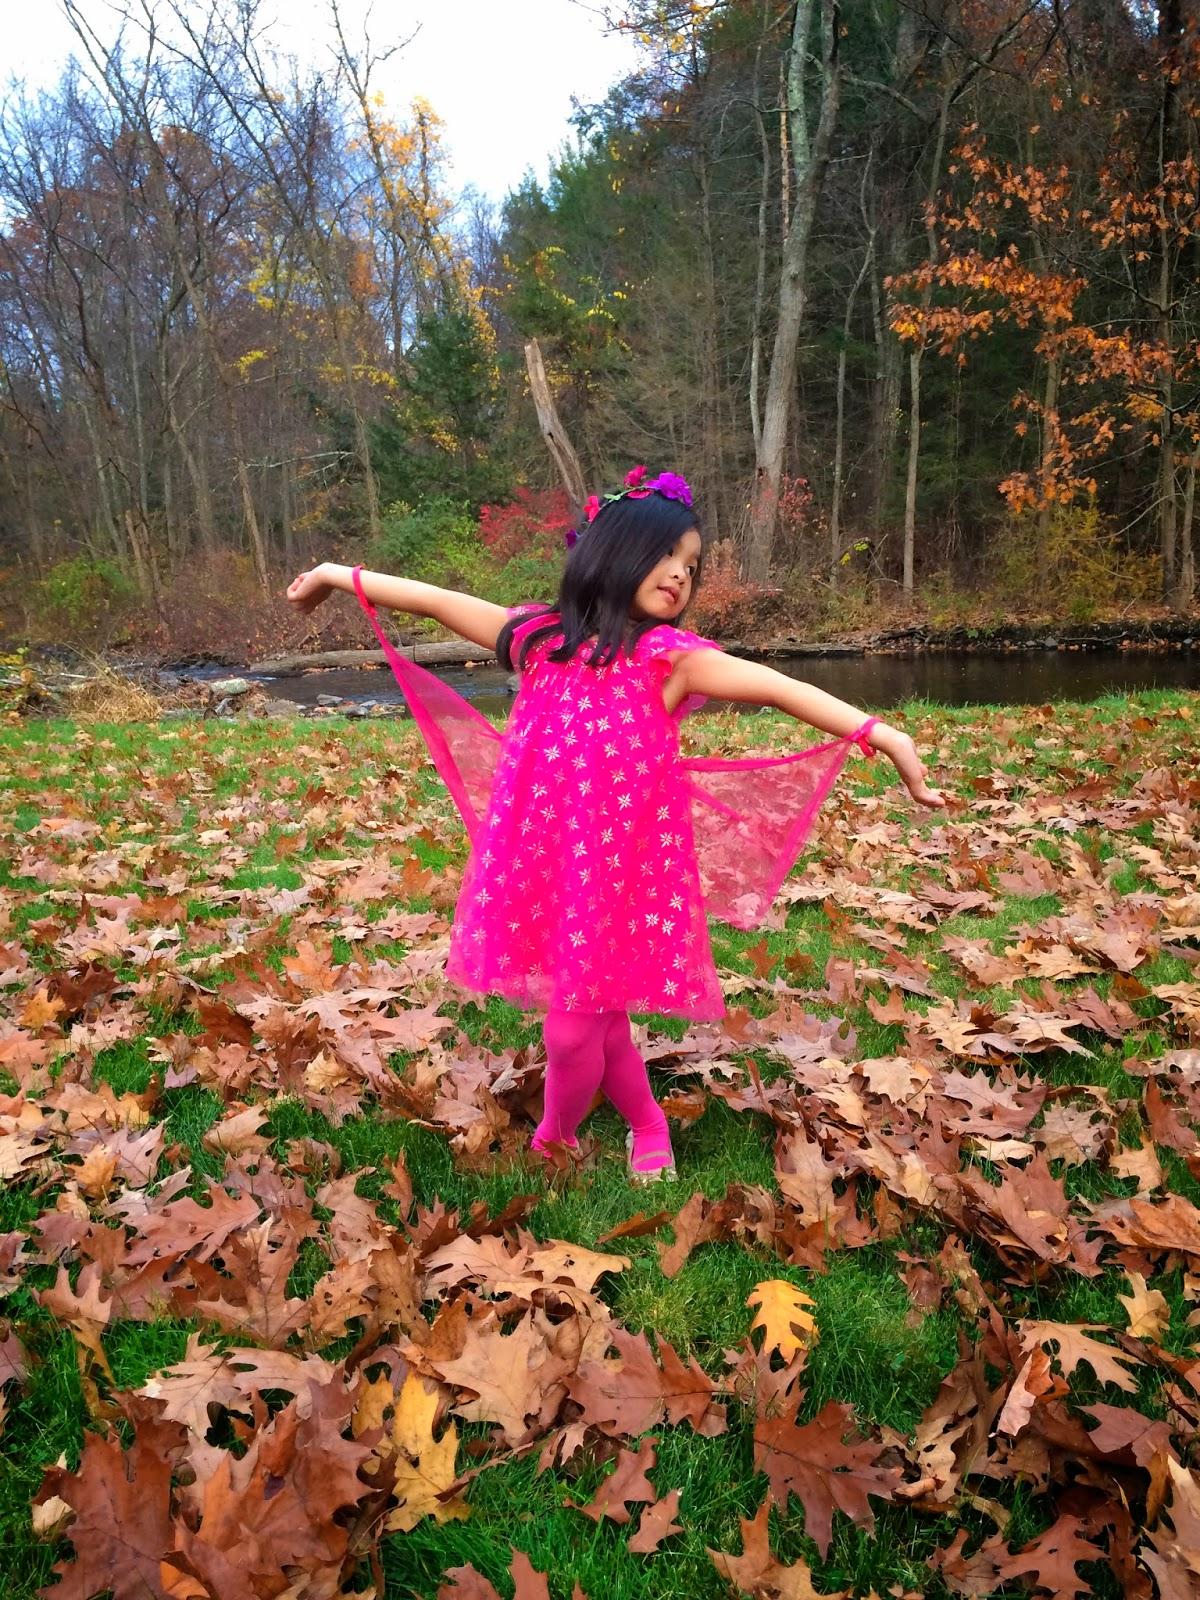 Fairy | Halloween Costume | Siaomimi Play | Chichi Mary & Chichi Mary: Pretty and Chic Halloween Costumes